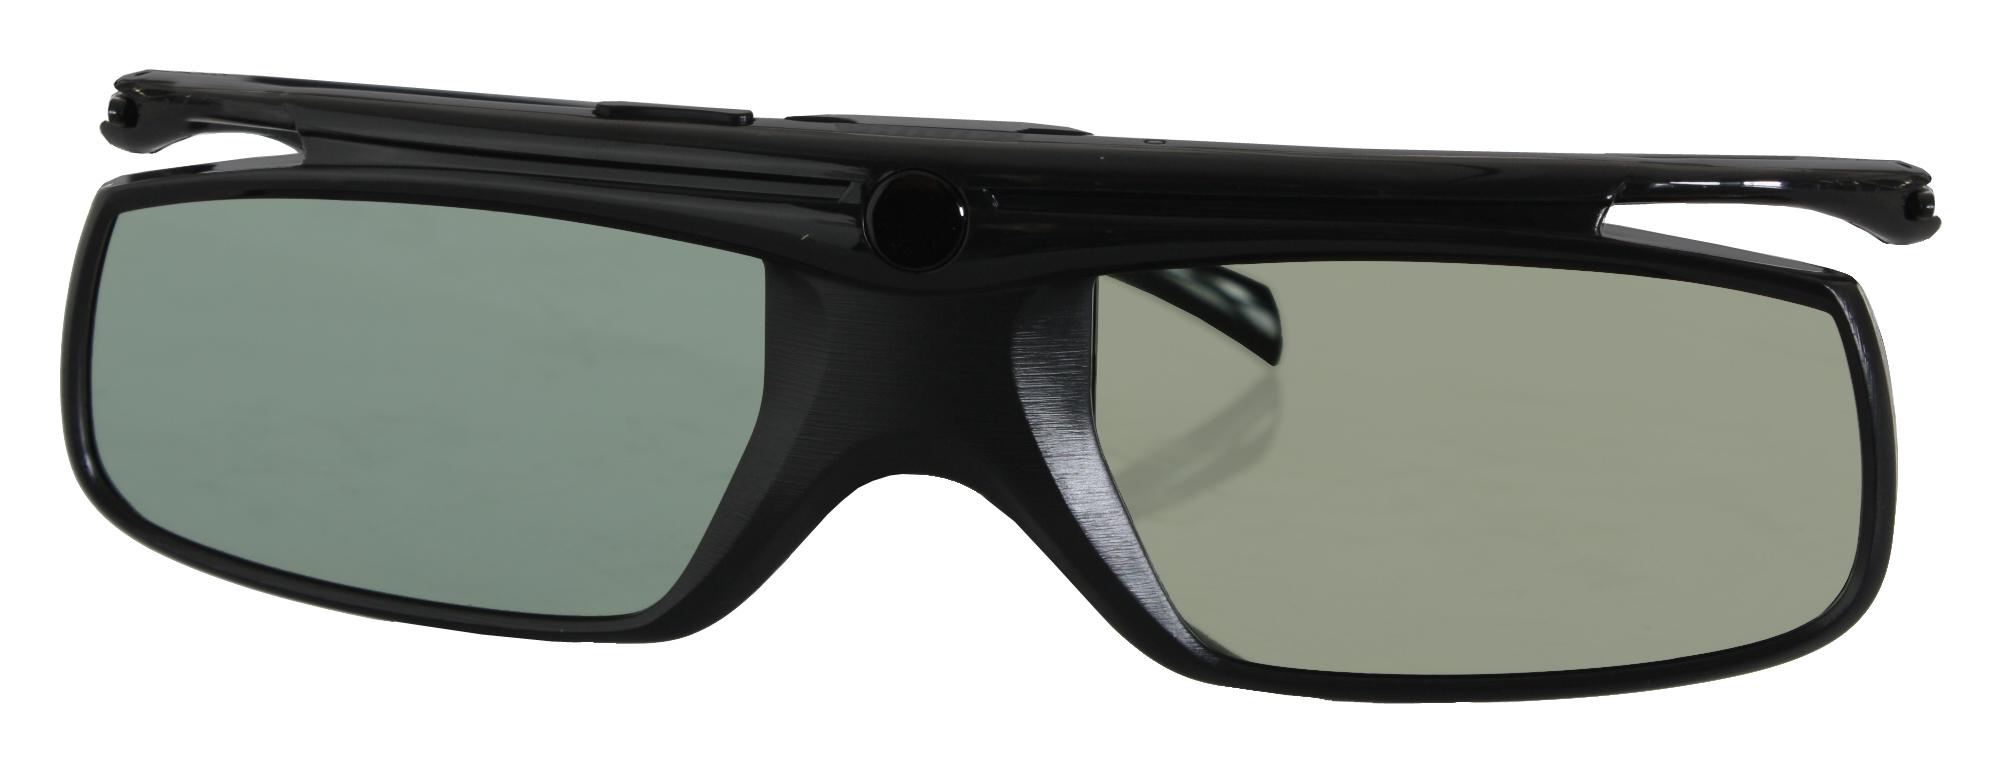 Активные 3d очки philips 1 фотография